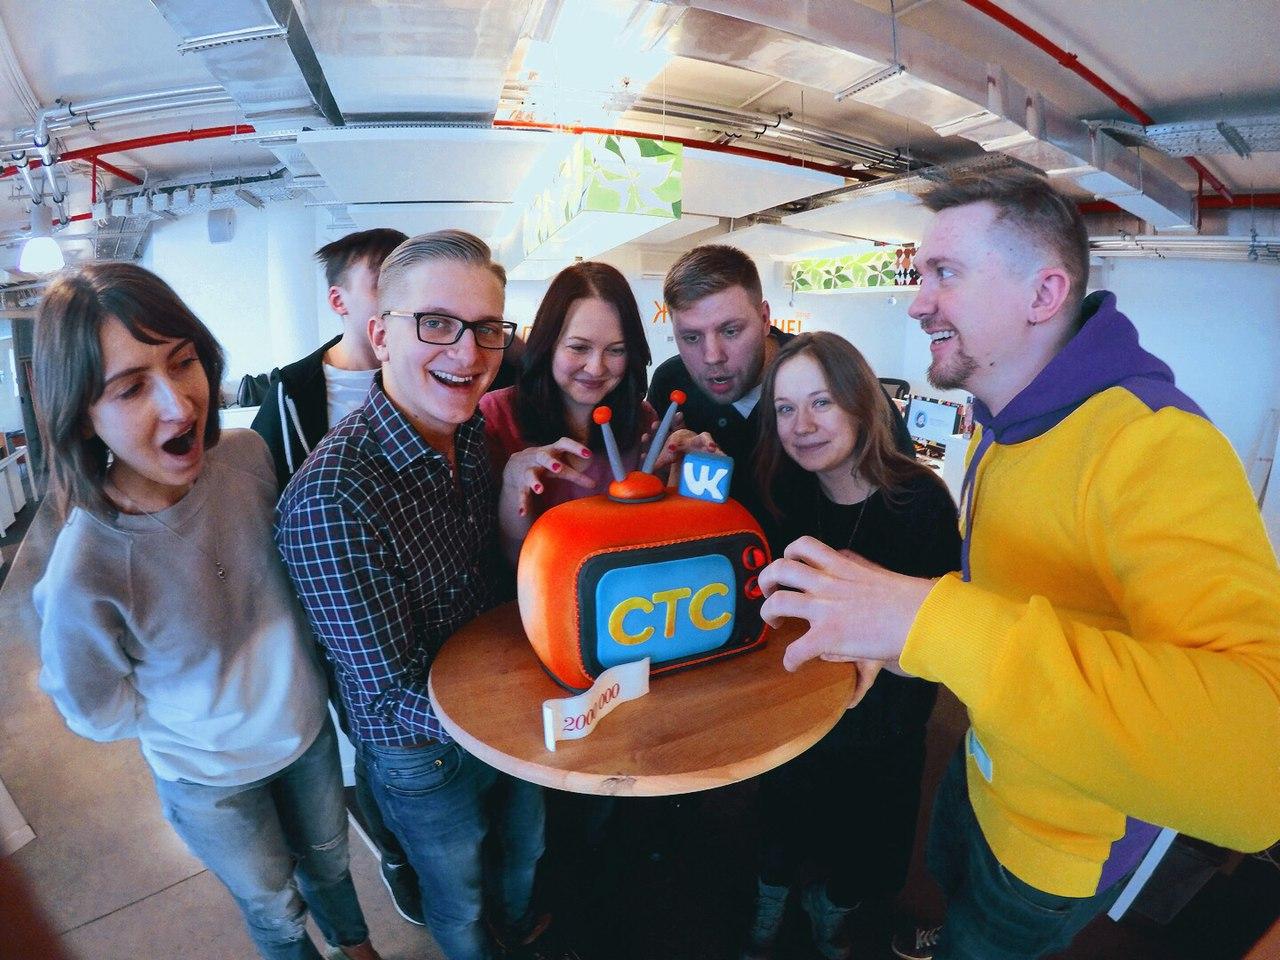 http://odry-cakes.ru/images/upload/IvNmMjcBd8Y-2.jpg